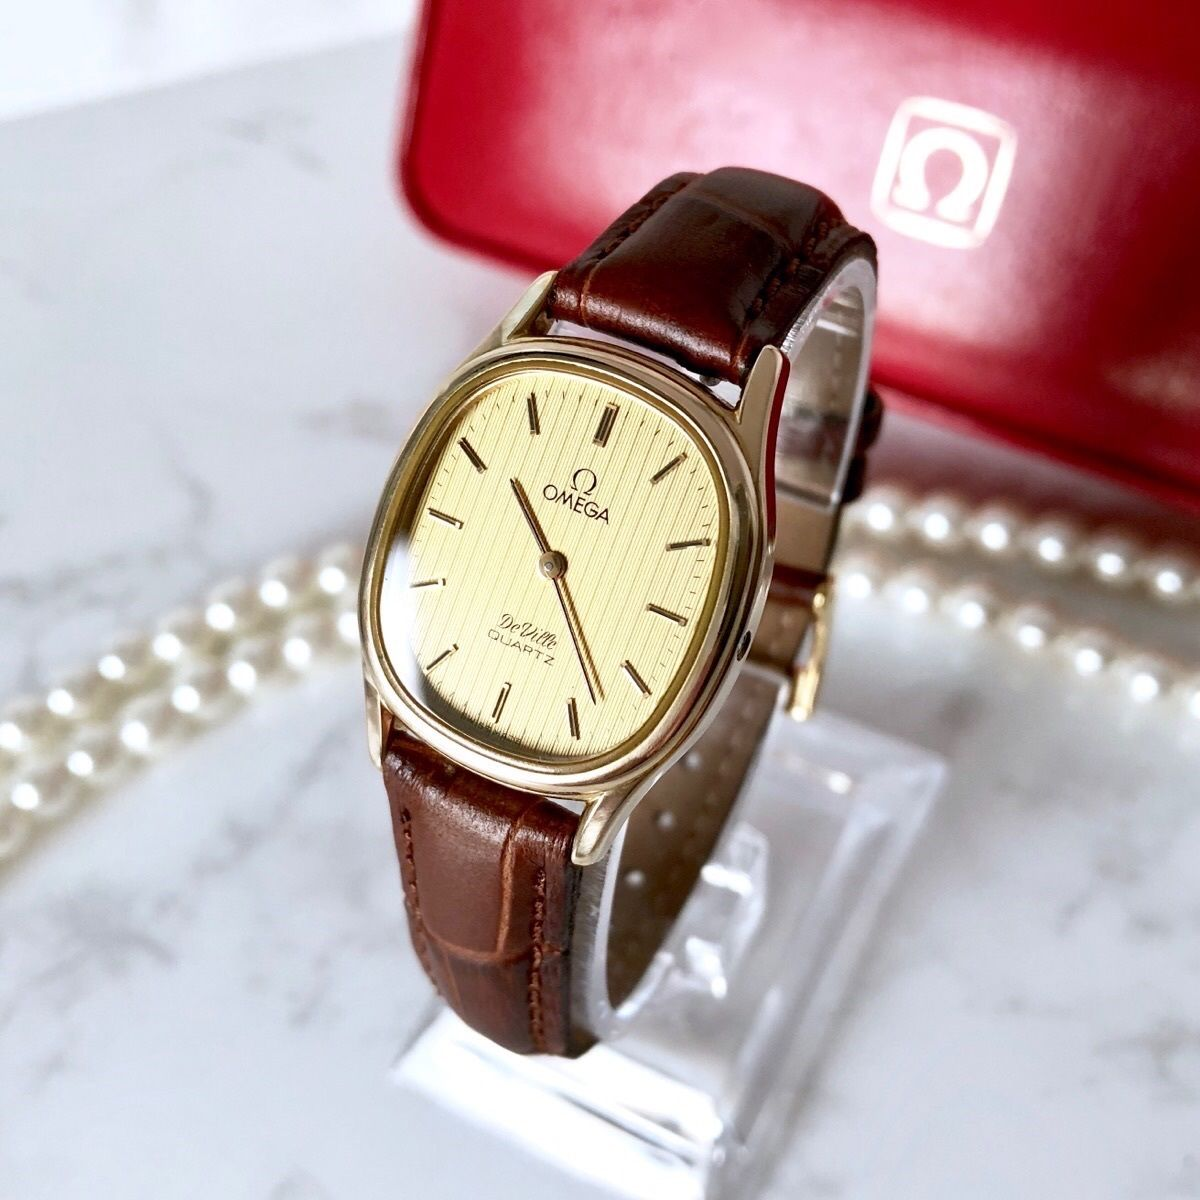 OMEGA オメガ デビル ベルト2色付き K18YGGP クォーツ レディース 腕時計